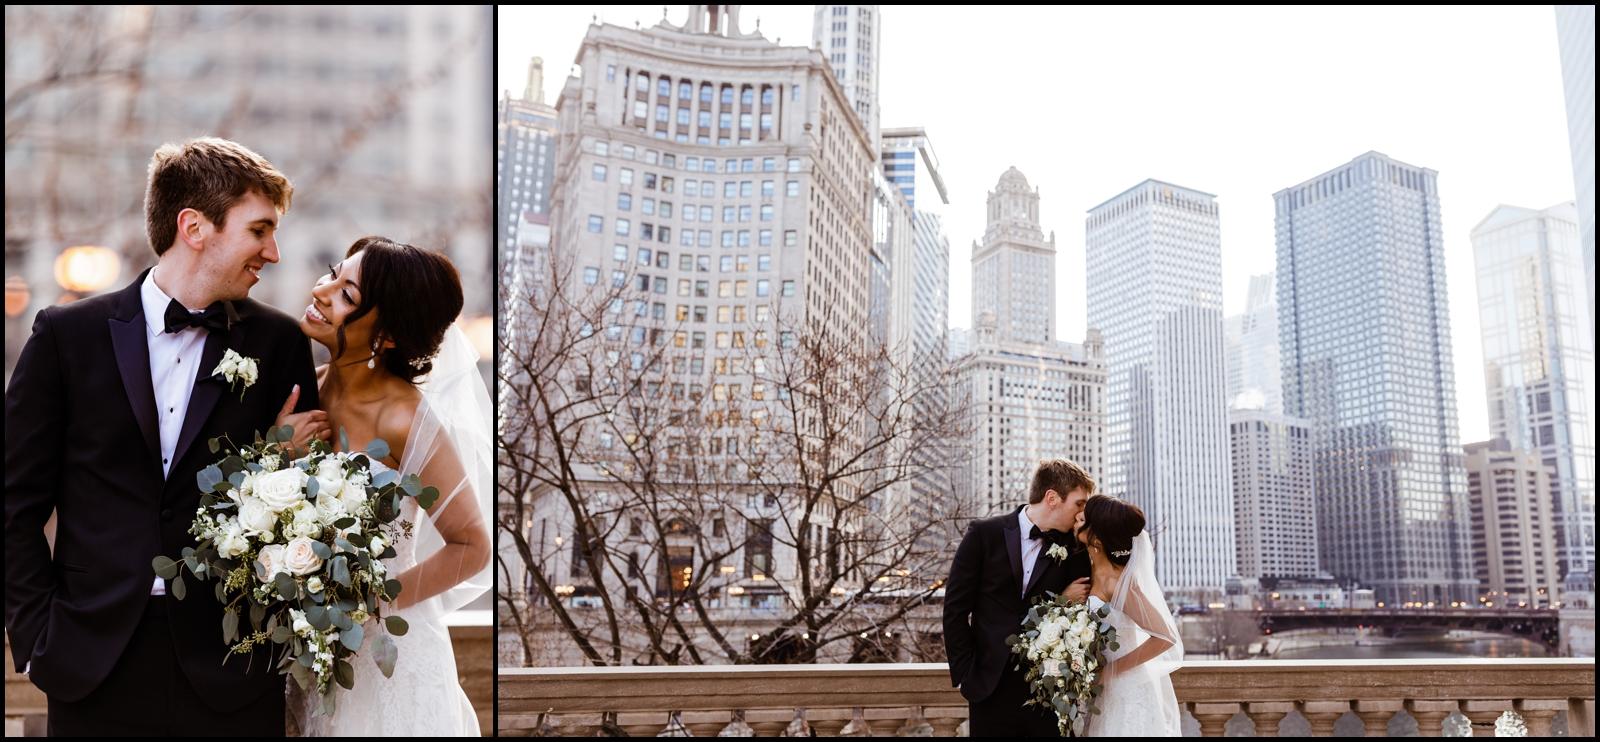 Chicago Wedding- Alice Millar Chapel Ceremony, London House Reception_0094.jpg